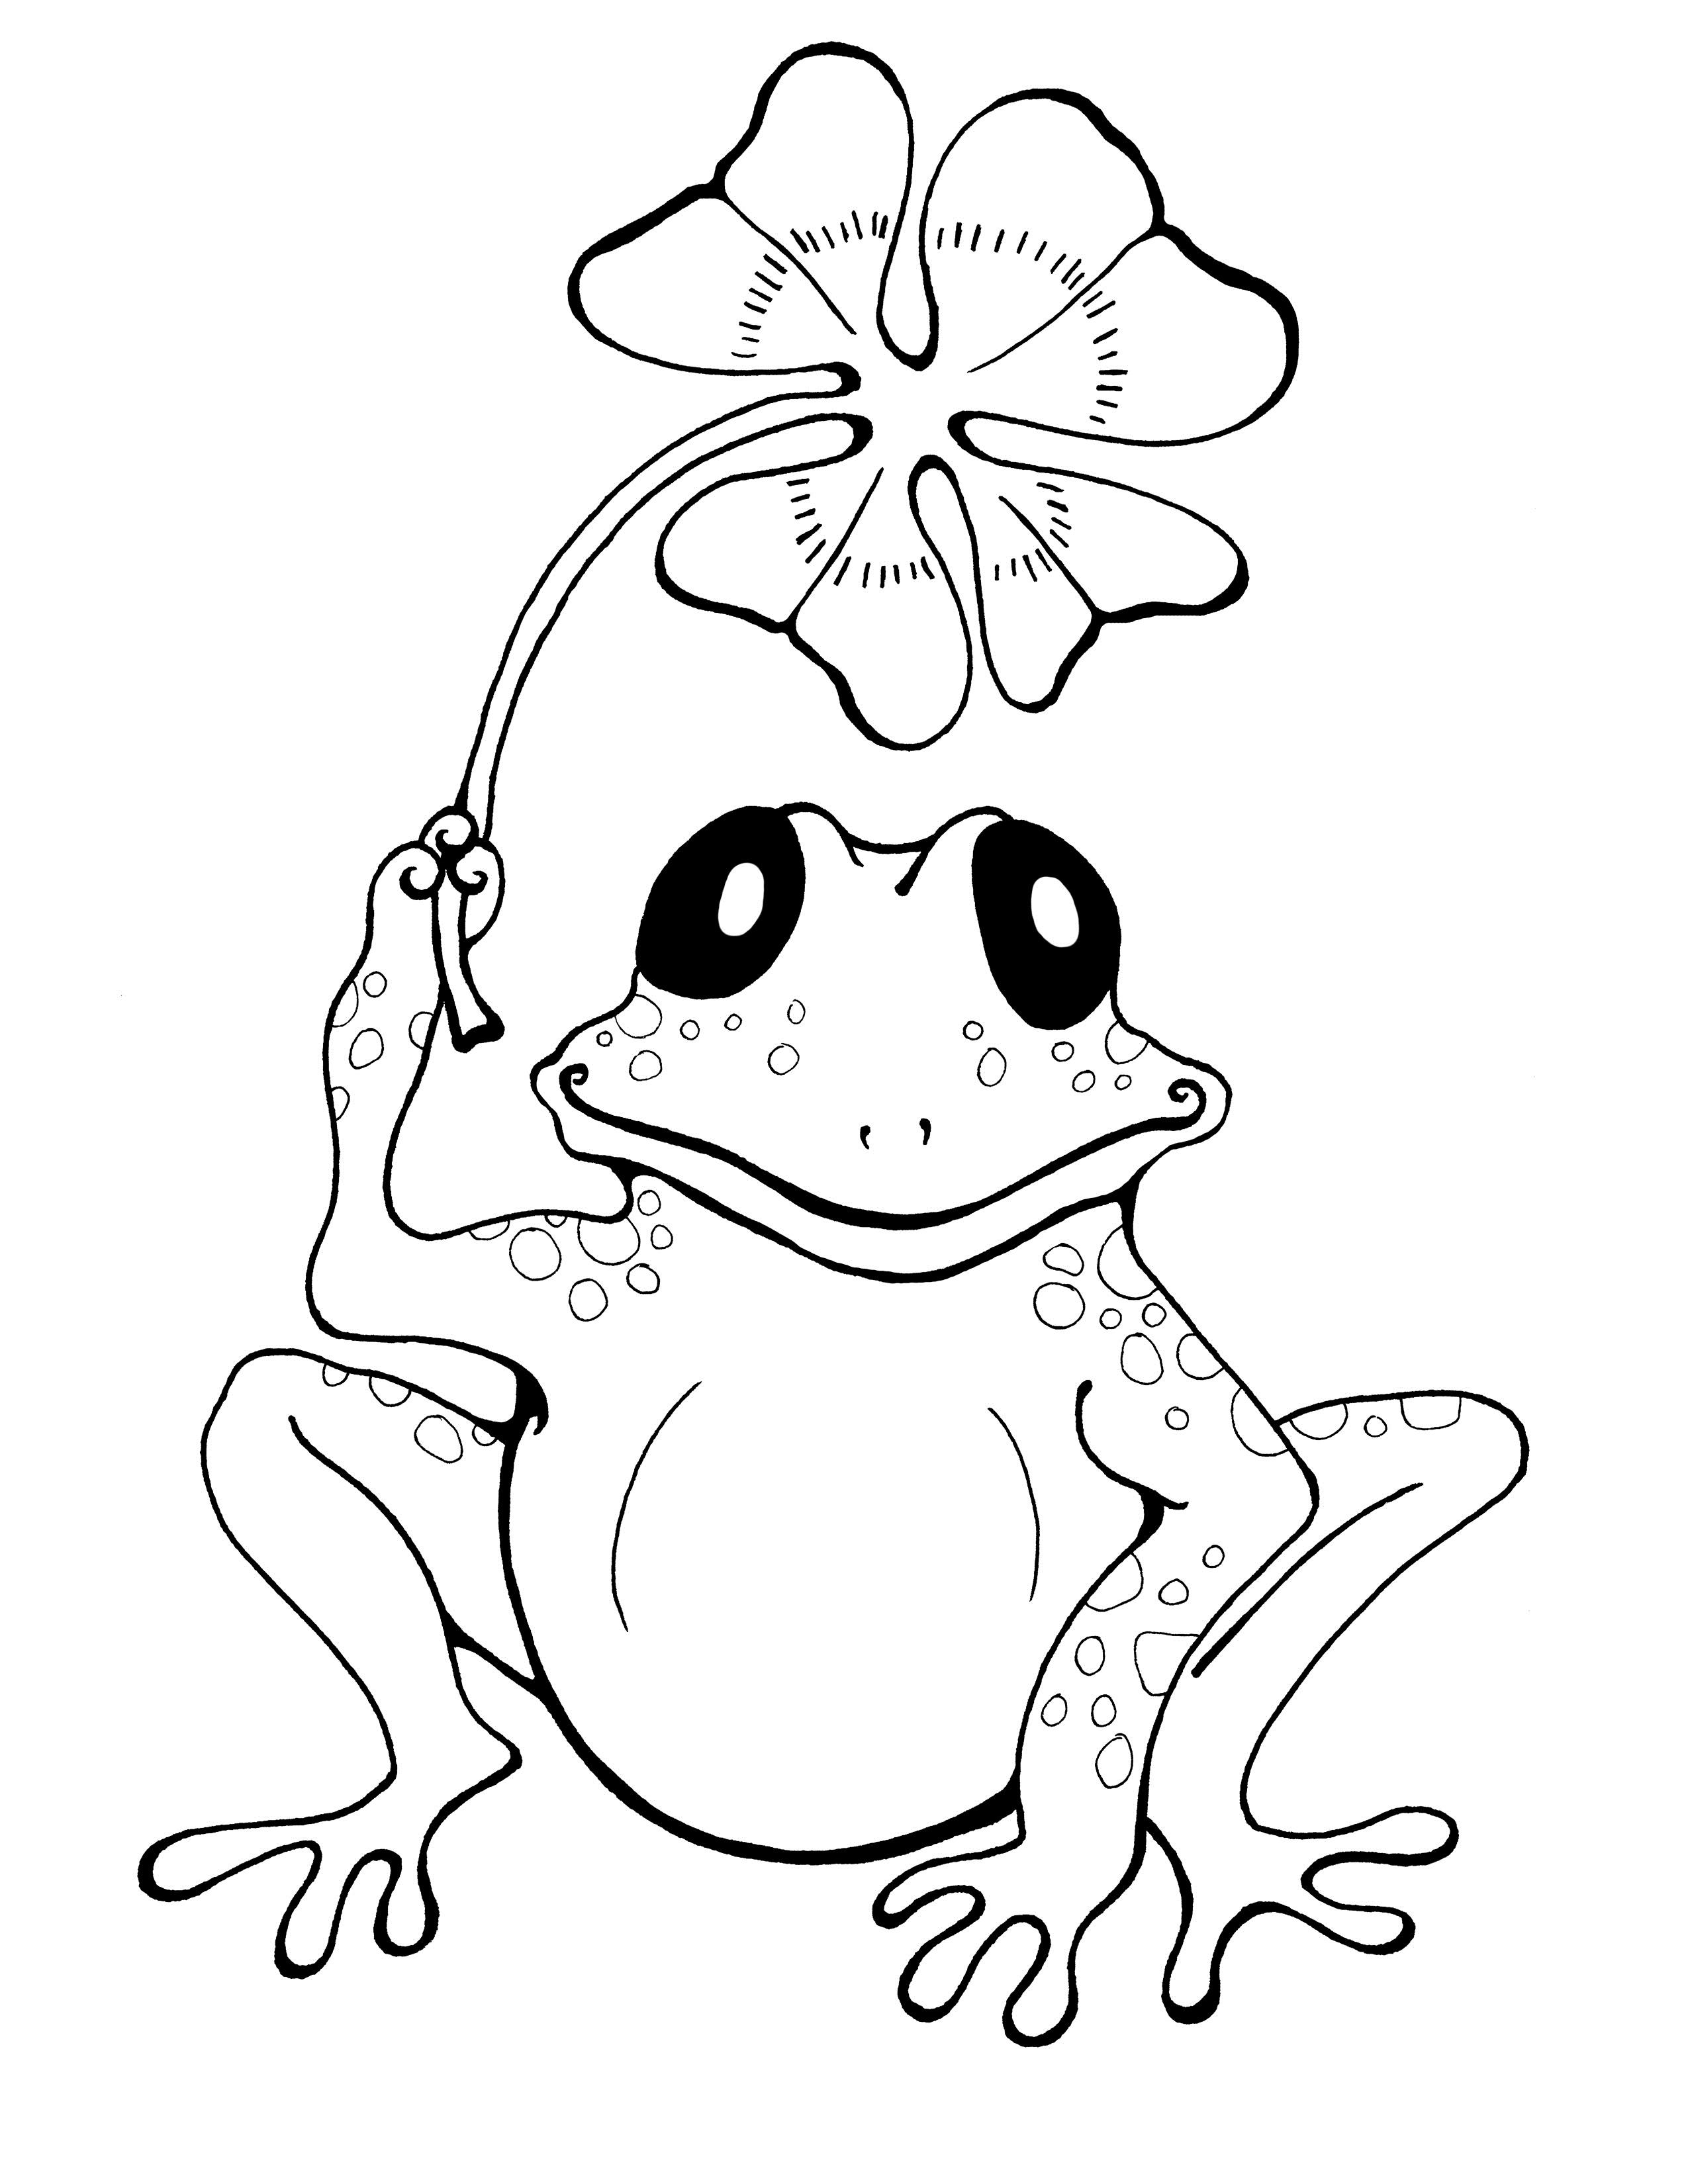 frog-color-sheet-funny